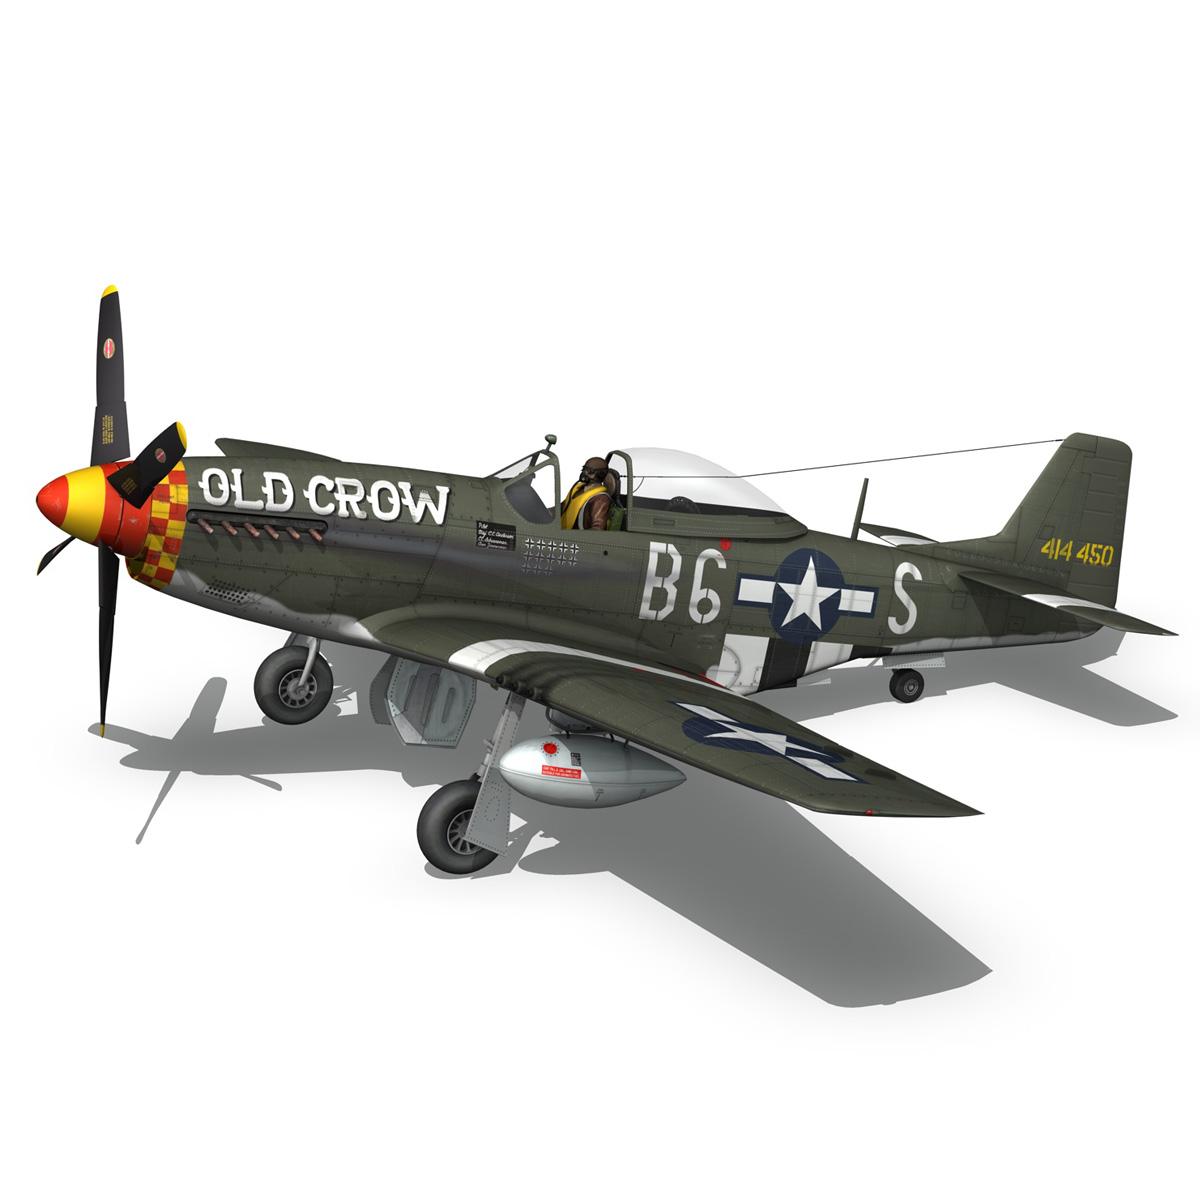 north american p-51d mustang – old crow 3d model fbx c4d lwo obj 273342